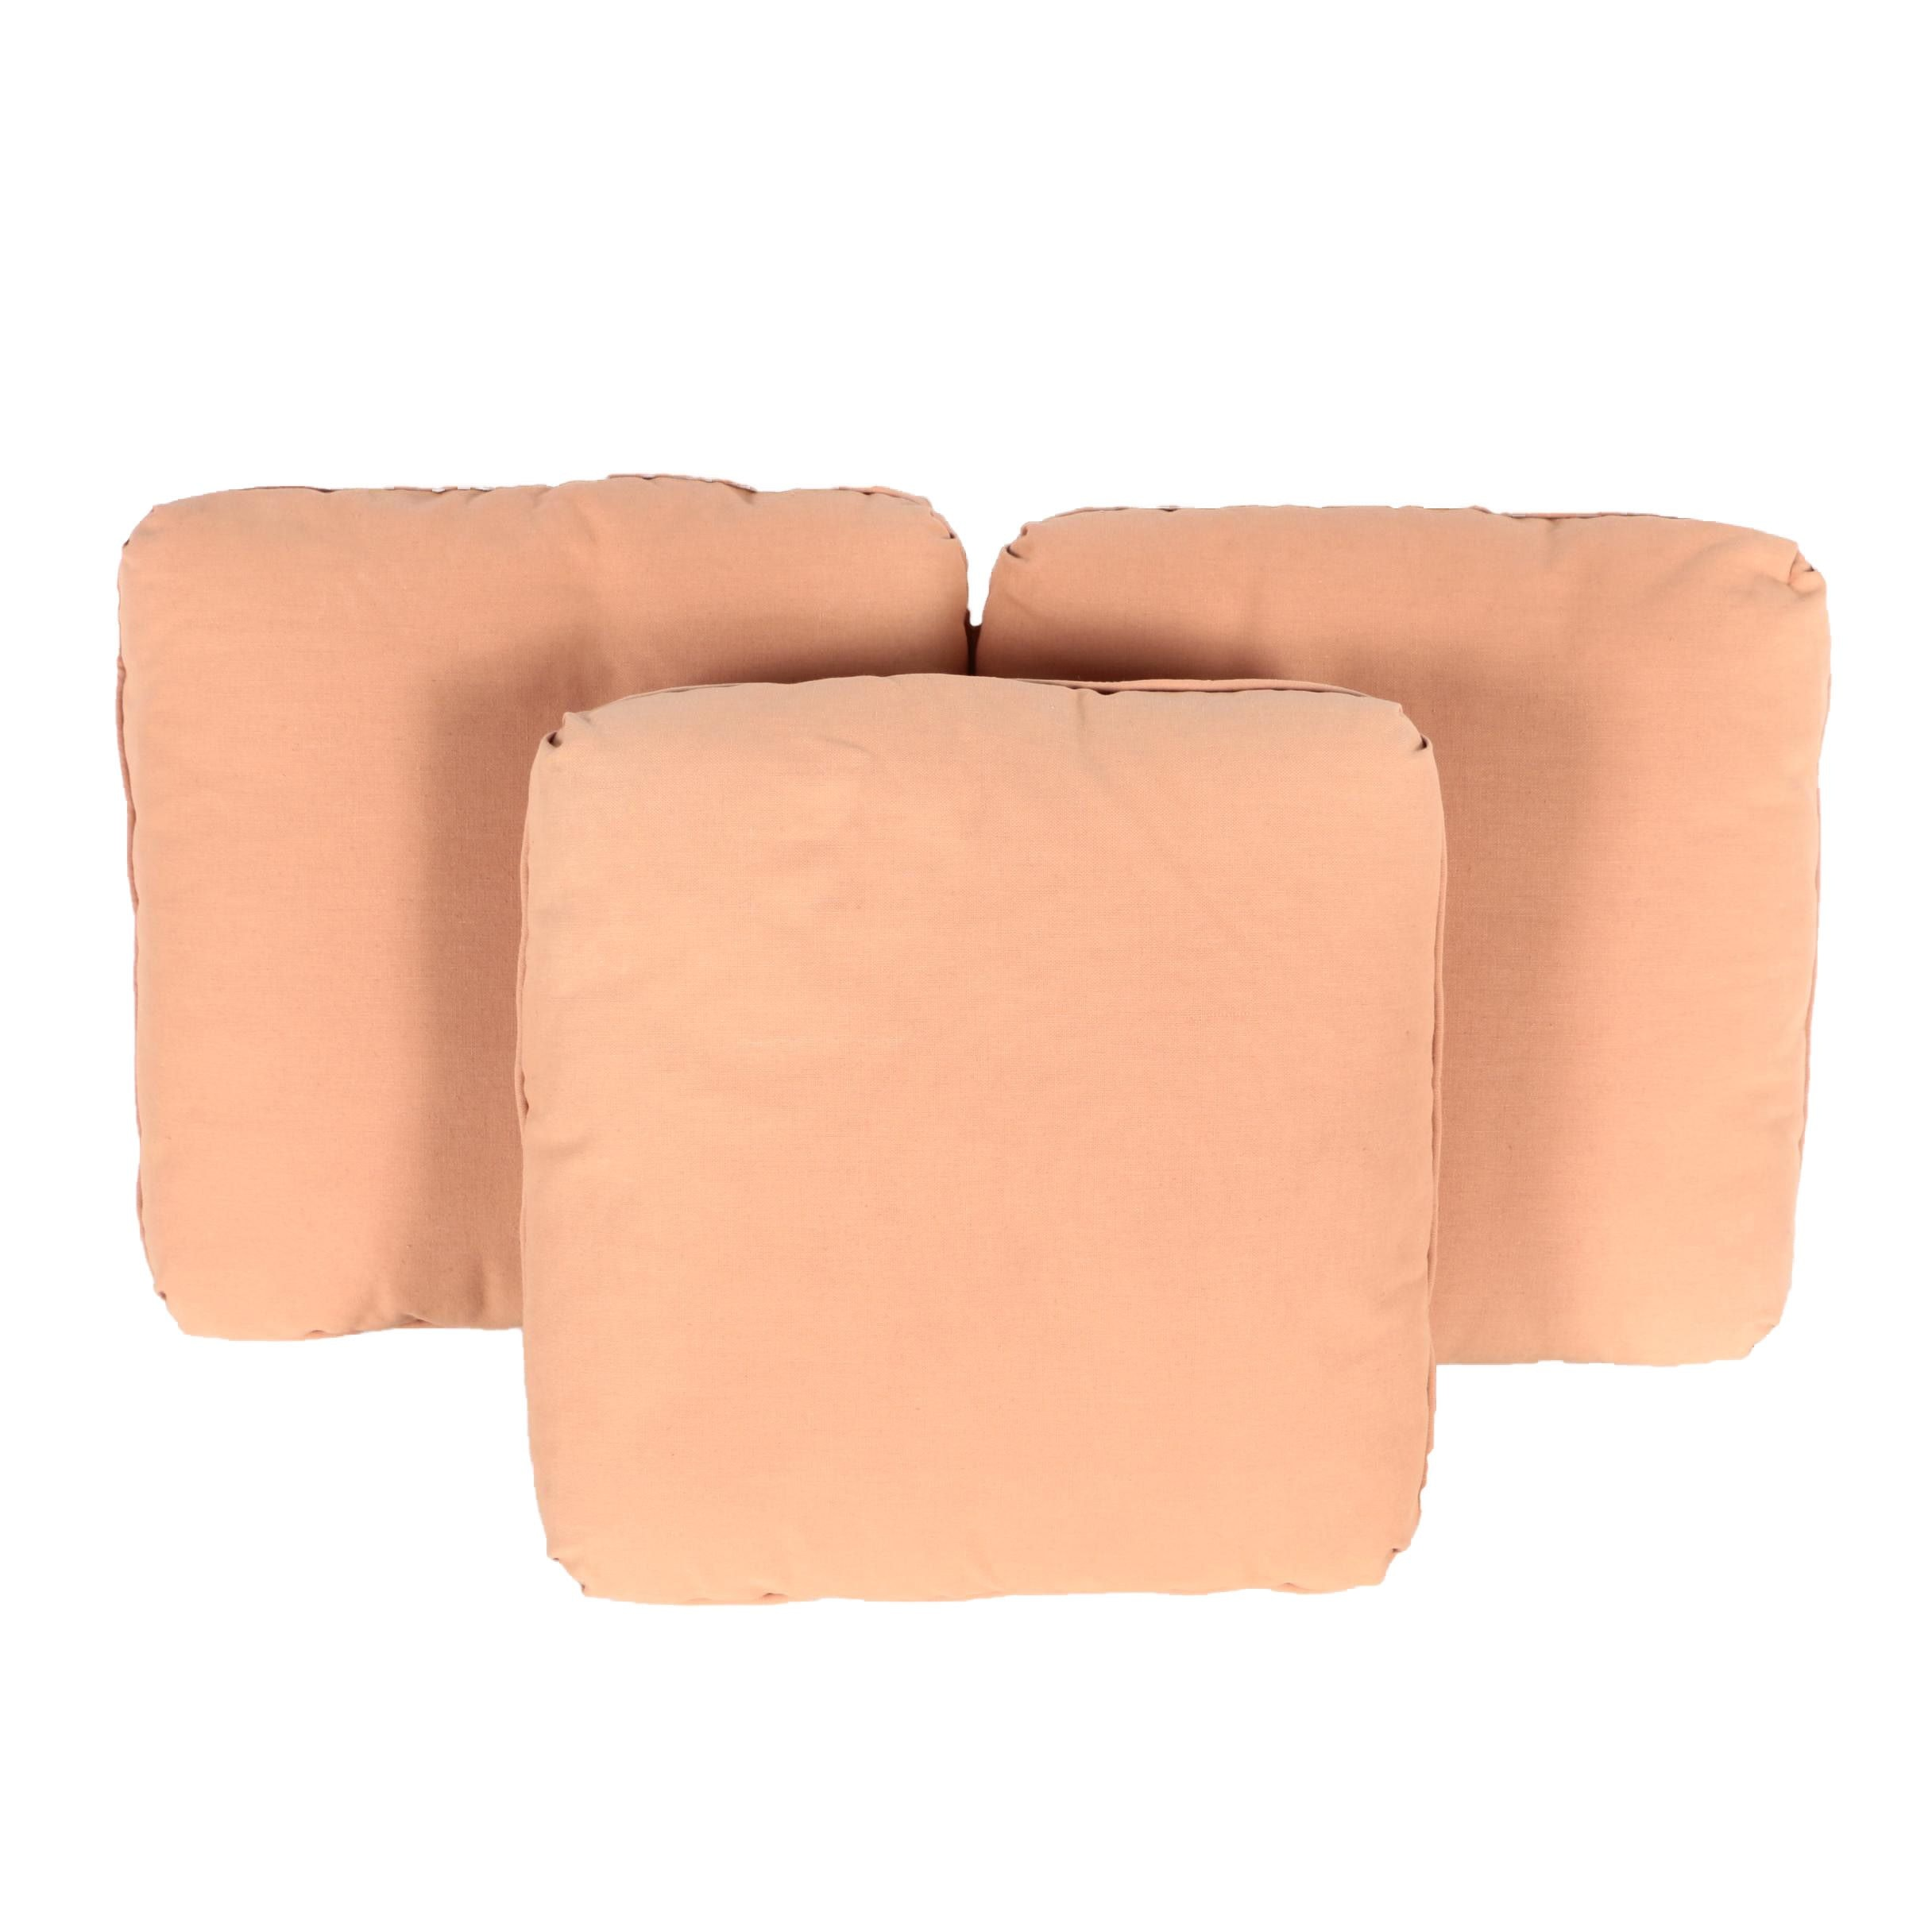 Three Accent Pillows